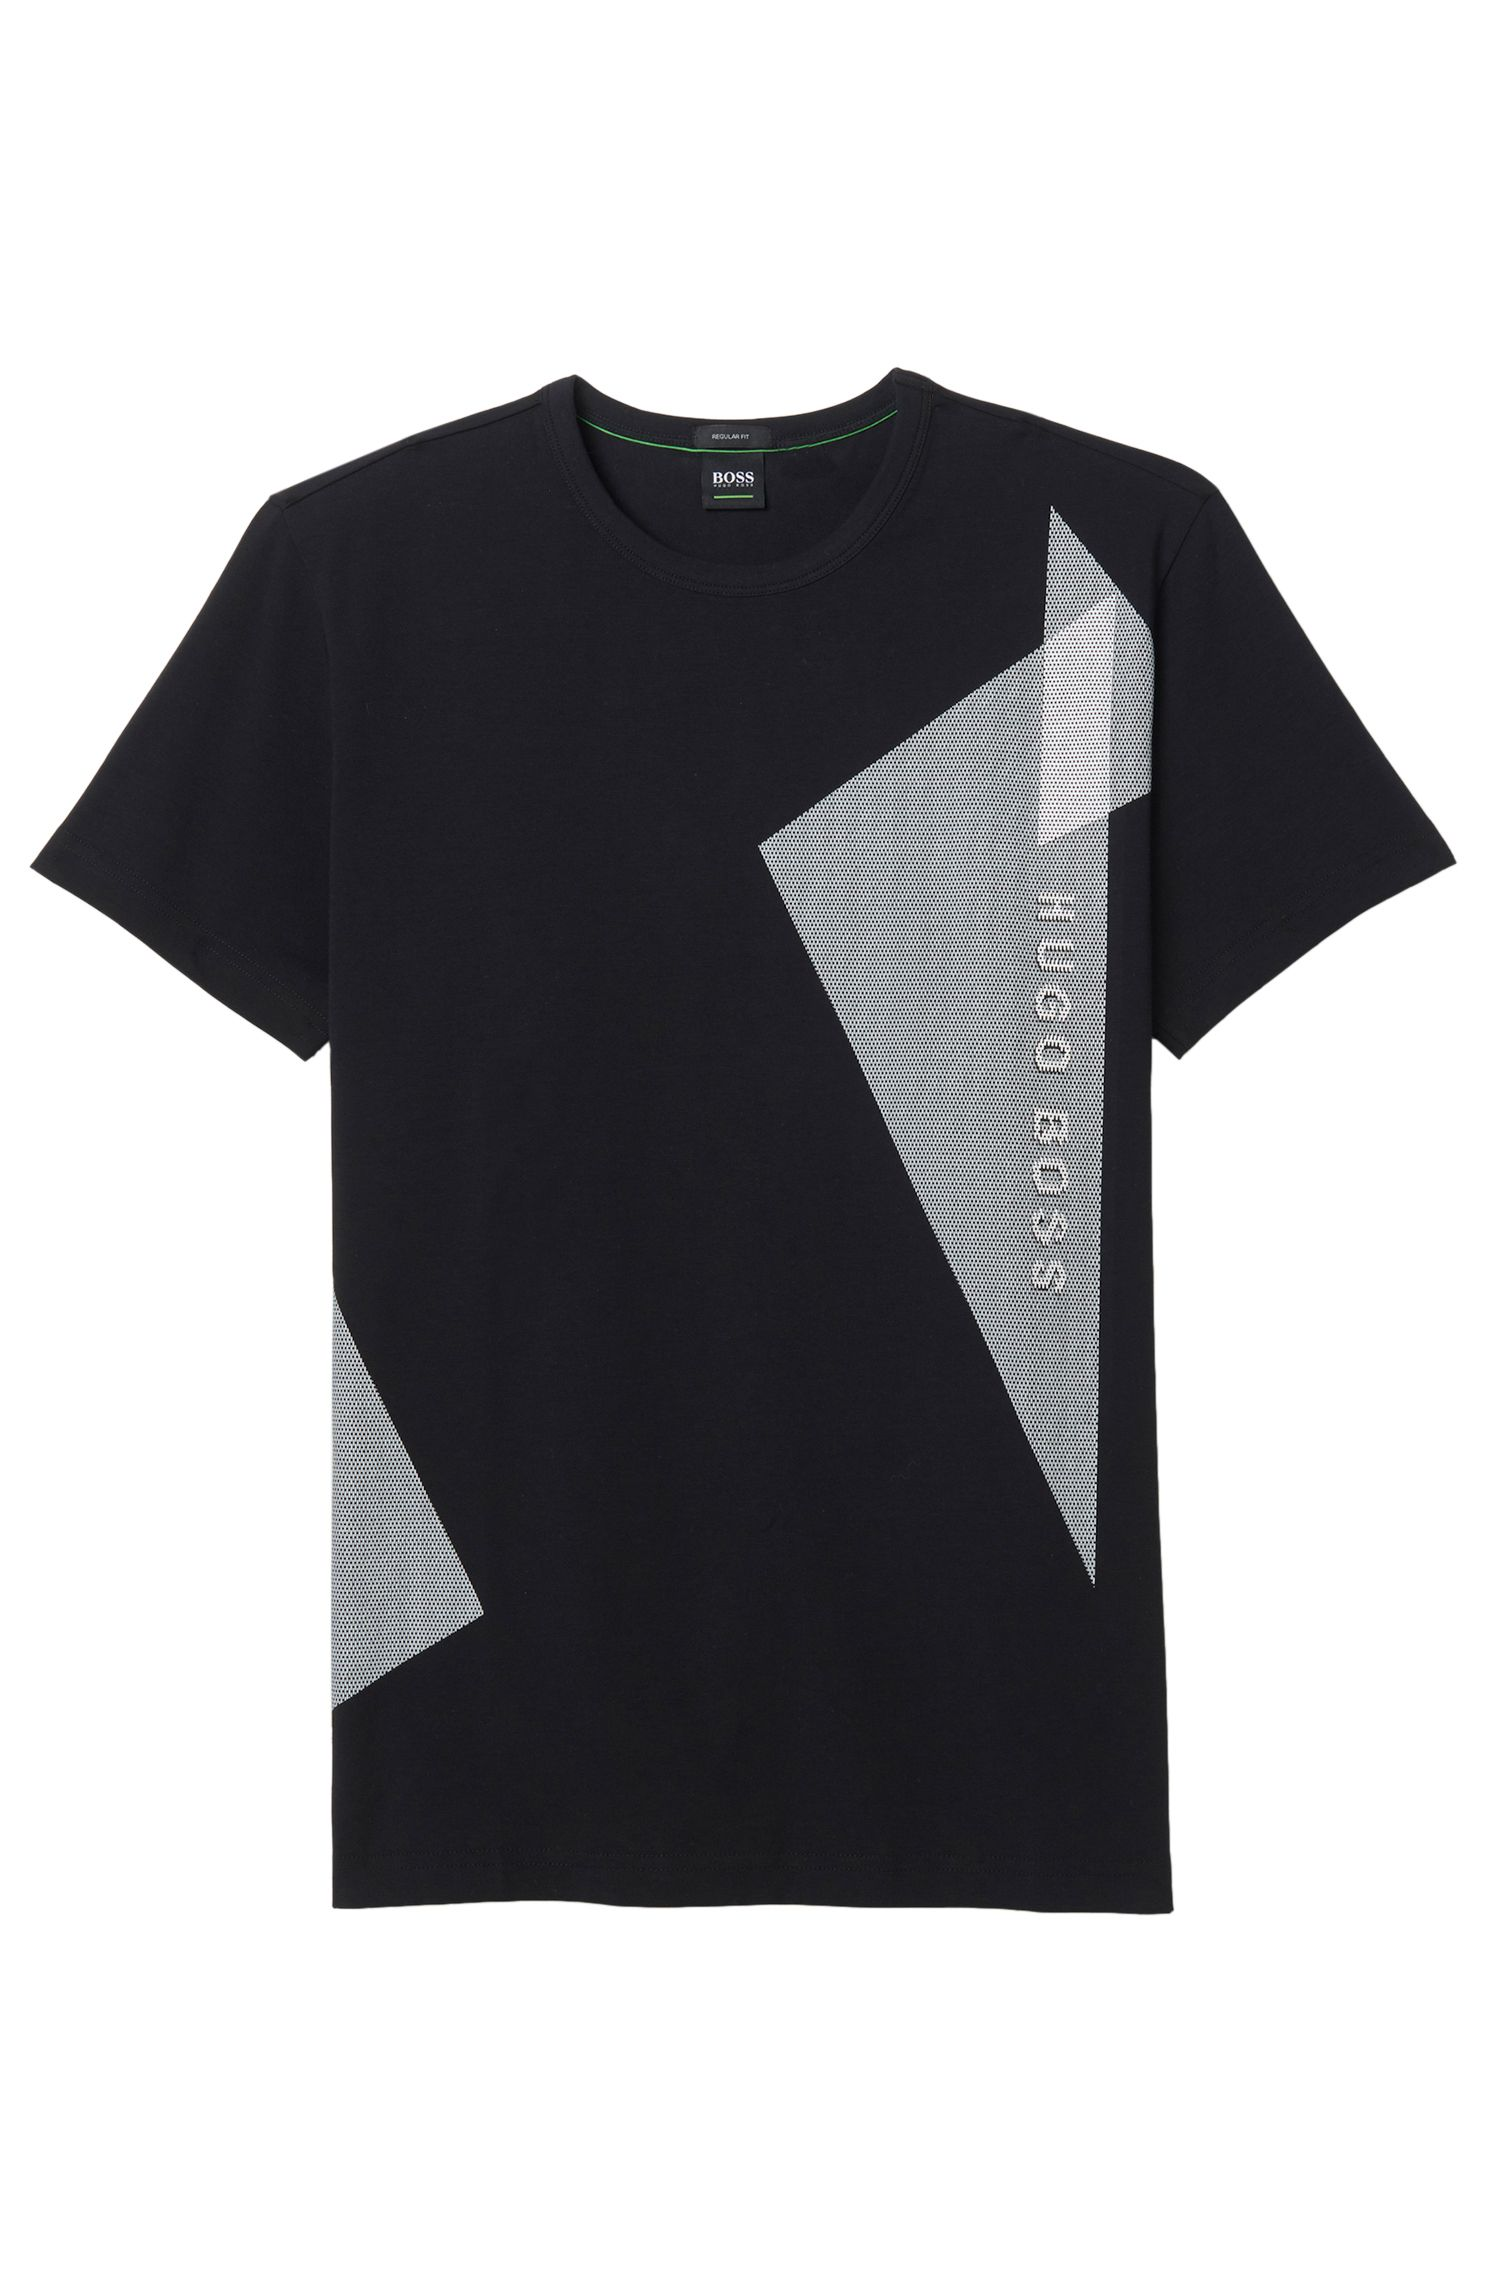 Stretch Cotton T-Shirt | Tee, Black